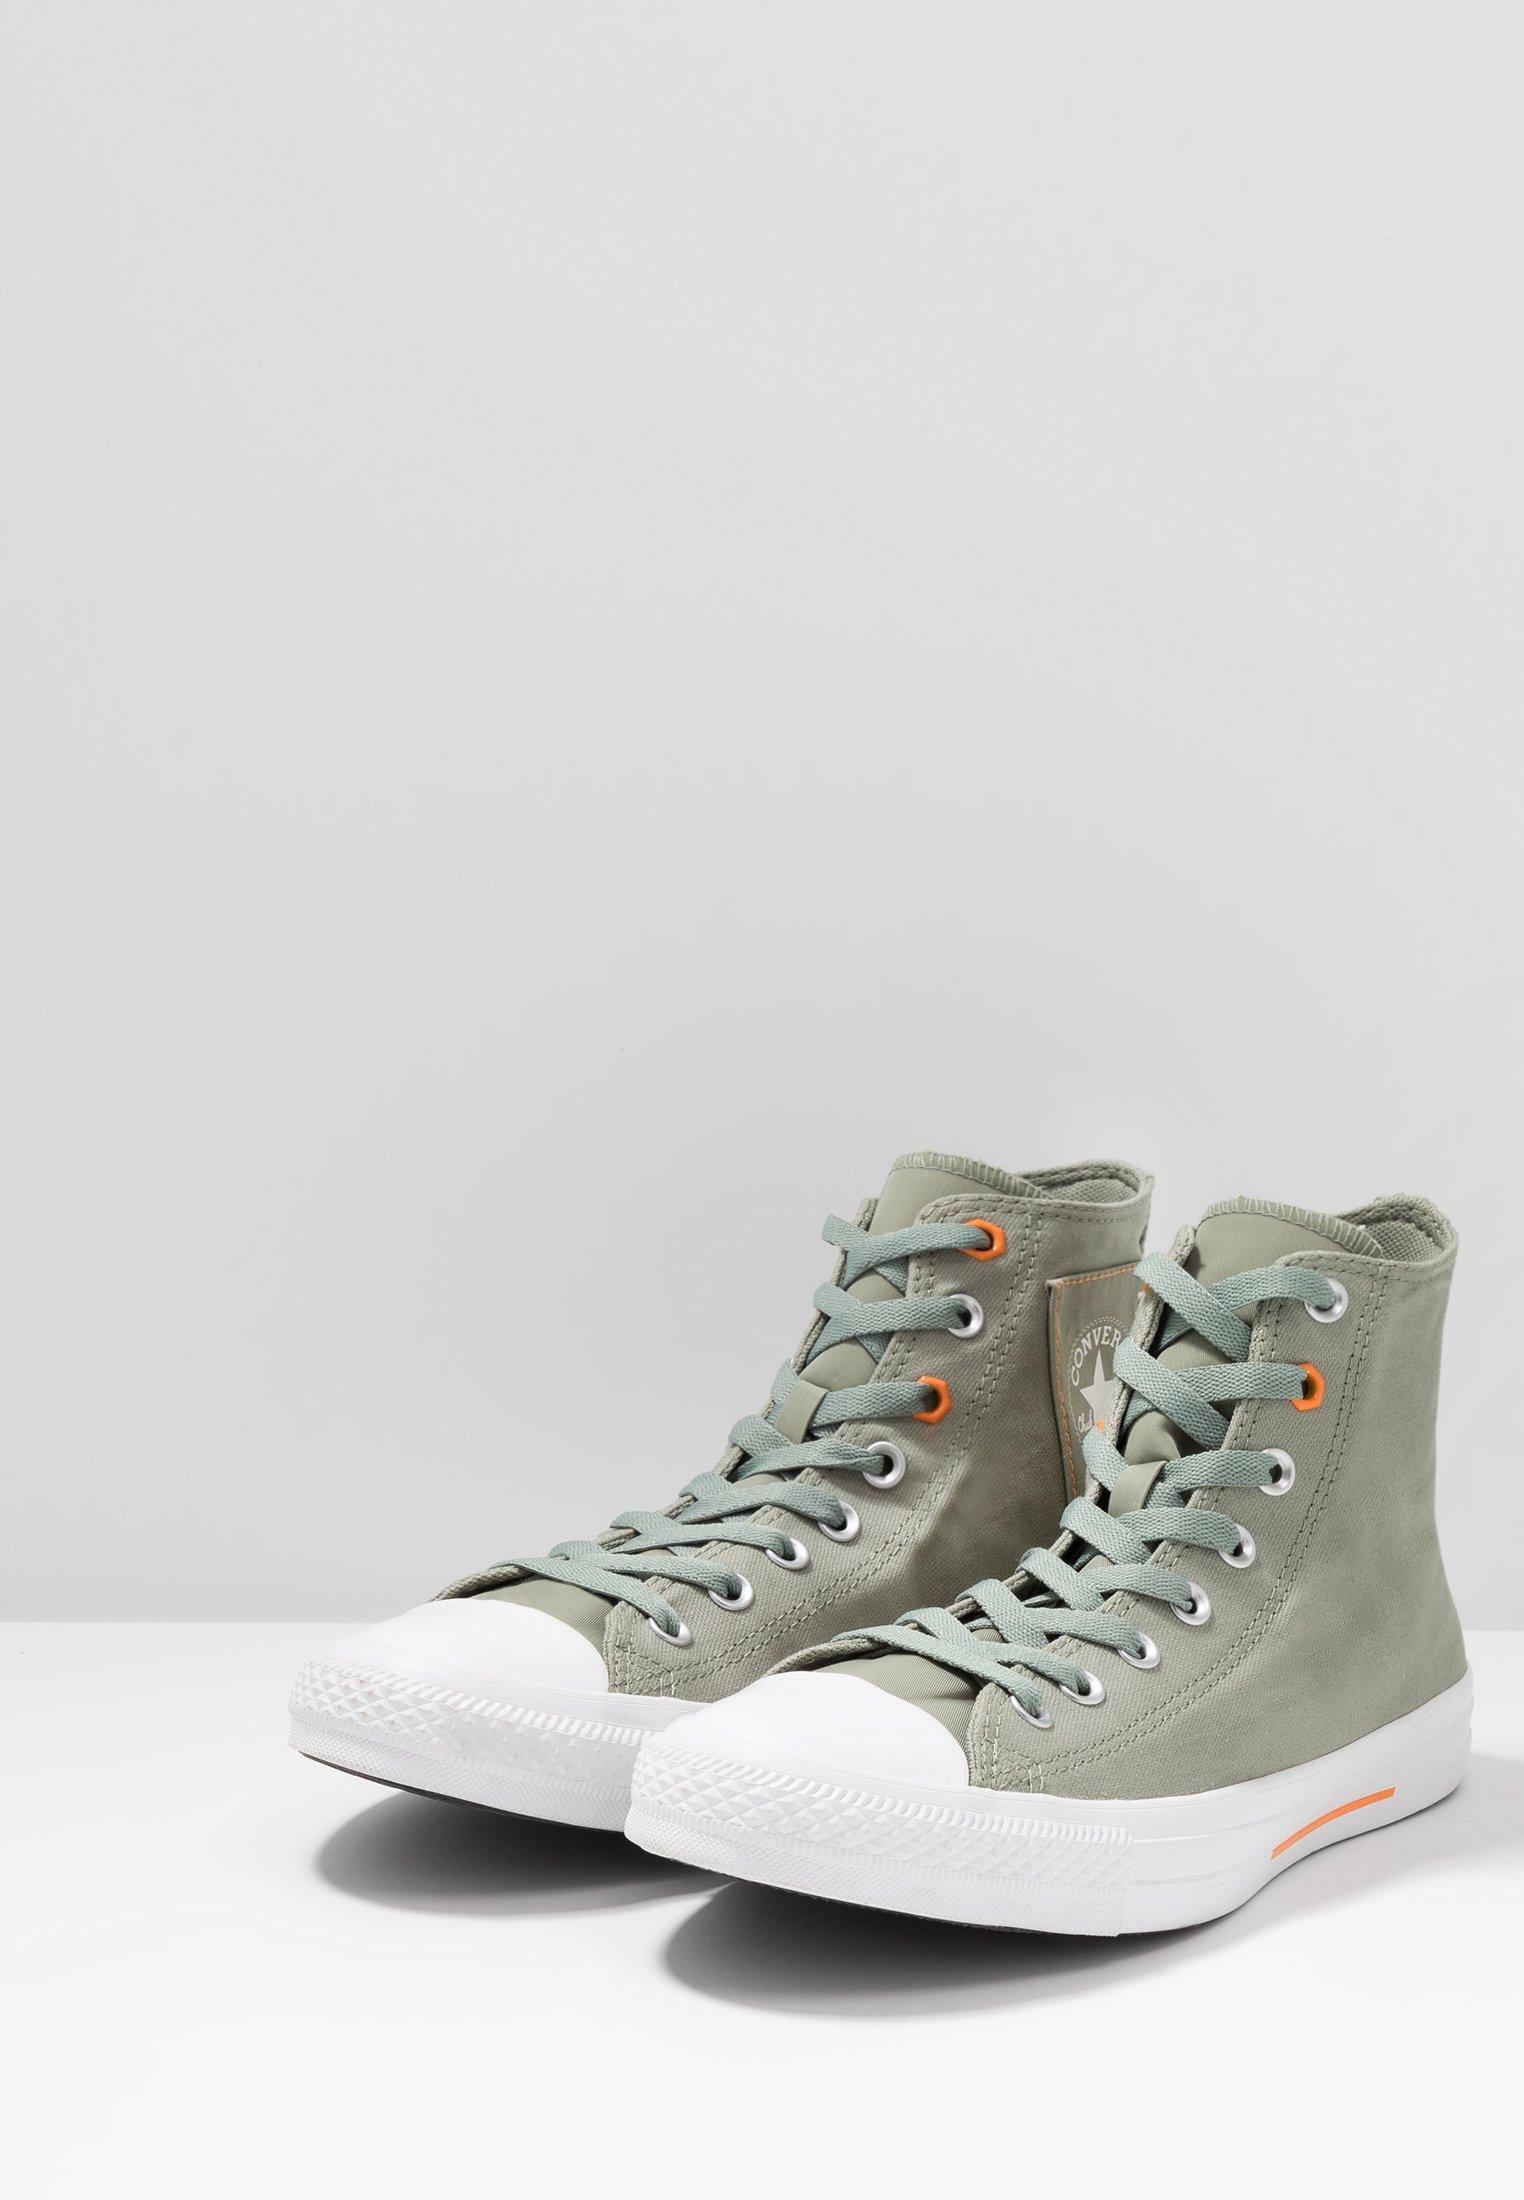 Converse Chuck Taylor All Star Flight School - Sneakers Hoog Jade Stone/orange Rind/white